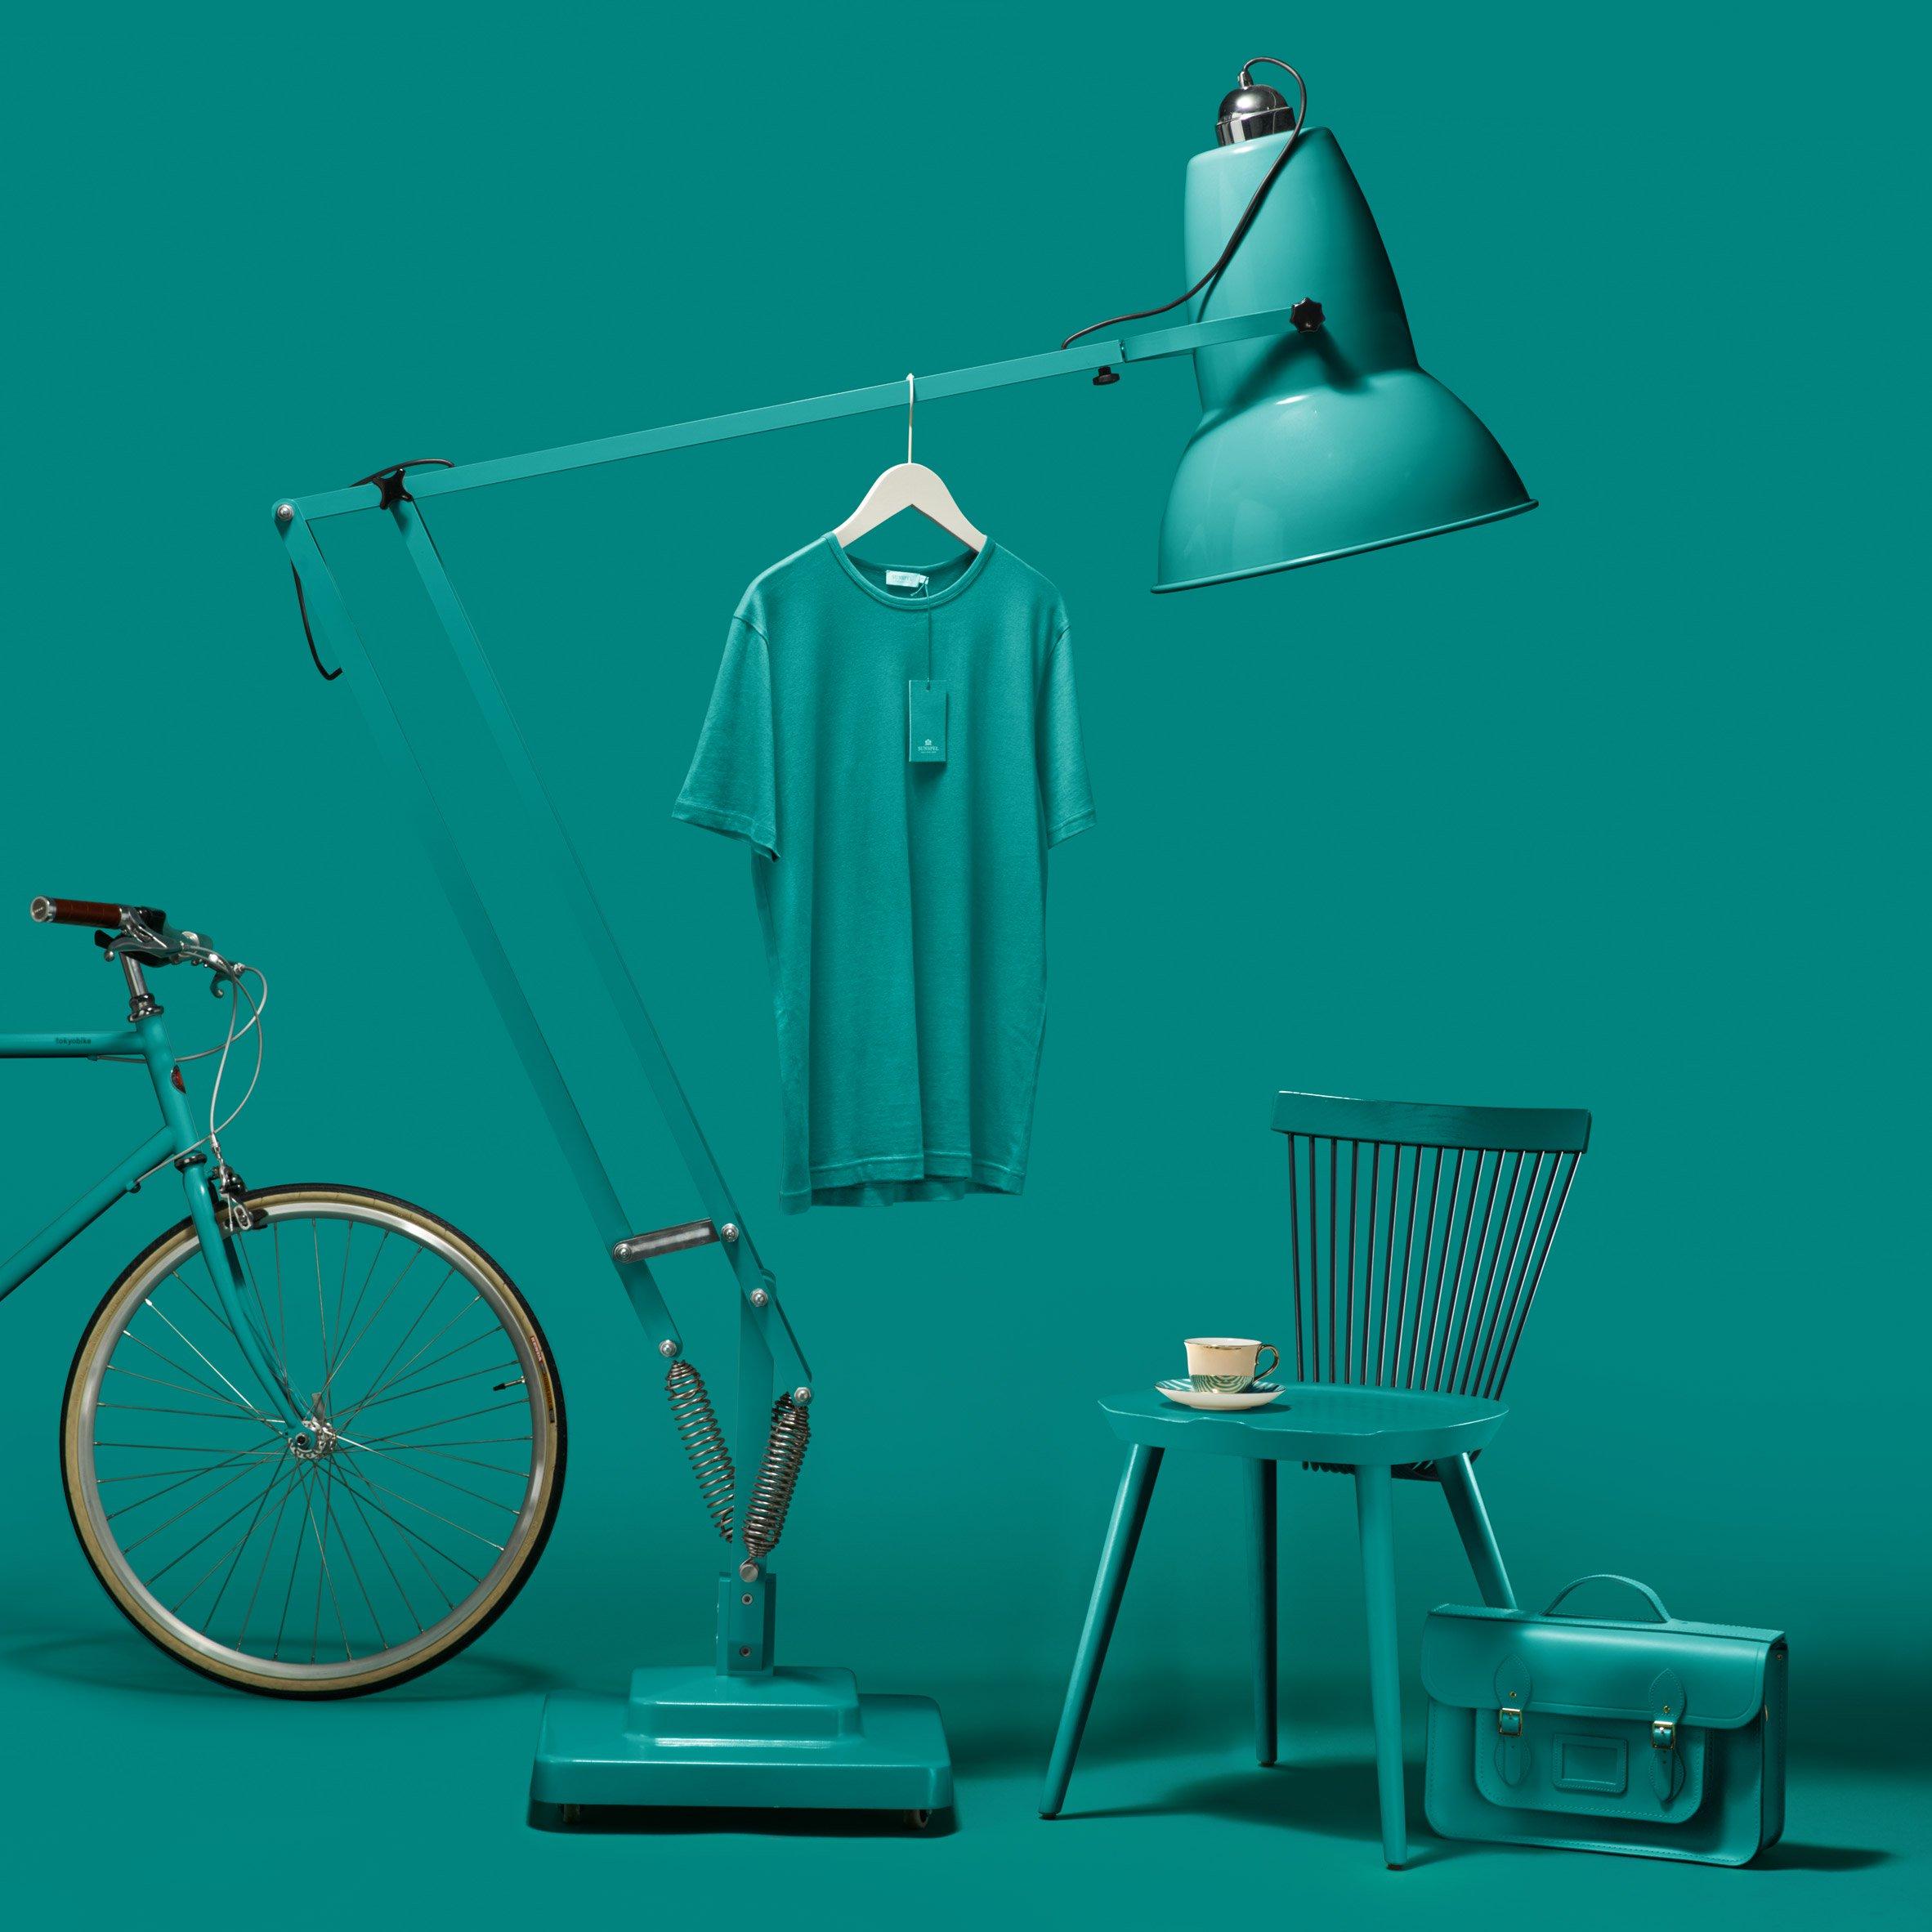 worlds-favourite-colour-paper-city-g-f-smith-design_dezeen_2364_col_24